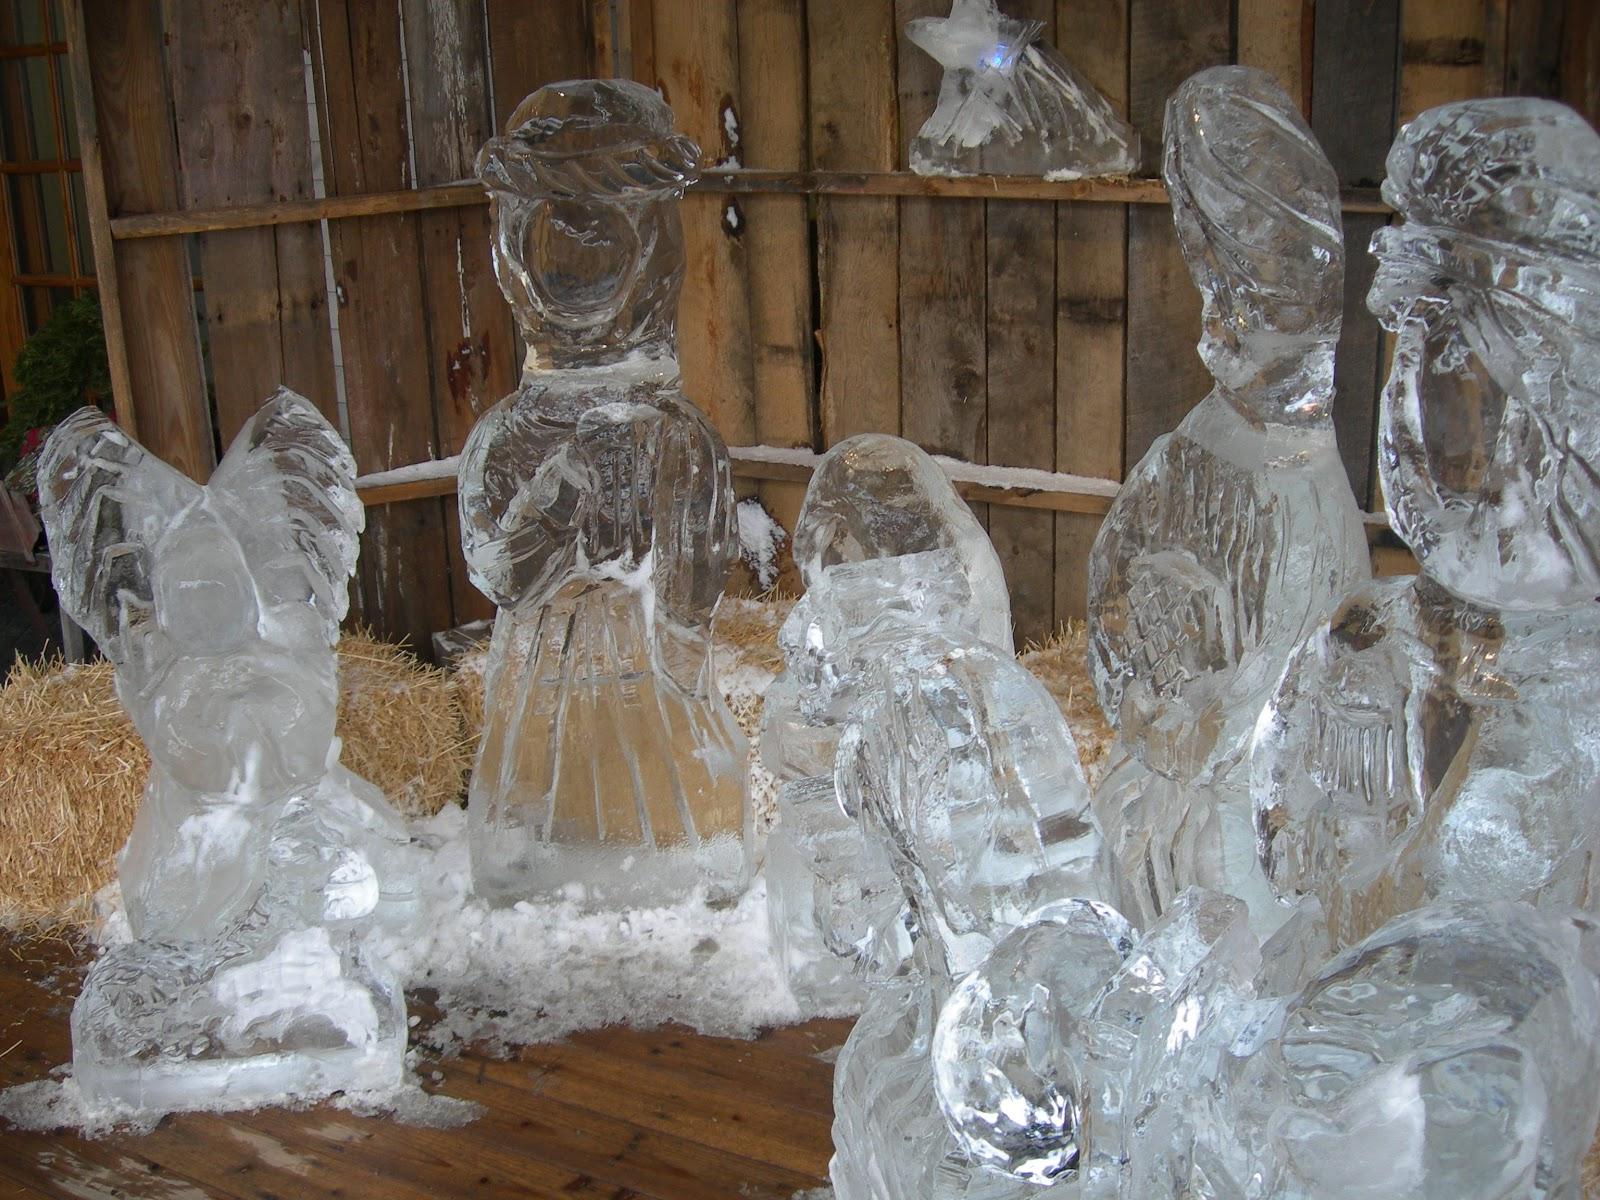 Indiana jasper county tefft - Frozen Nativity Scene